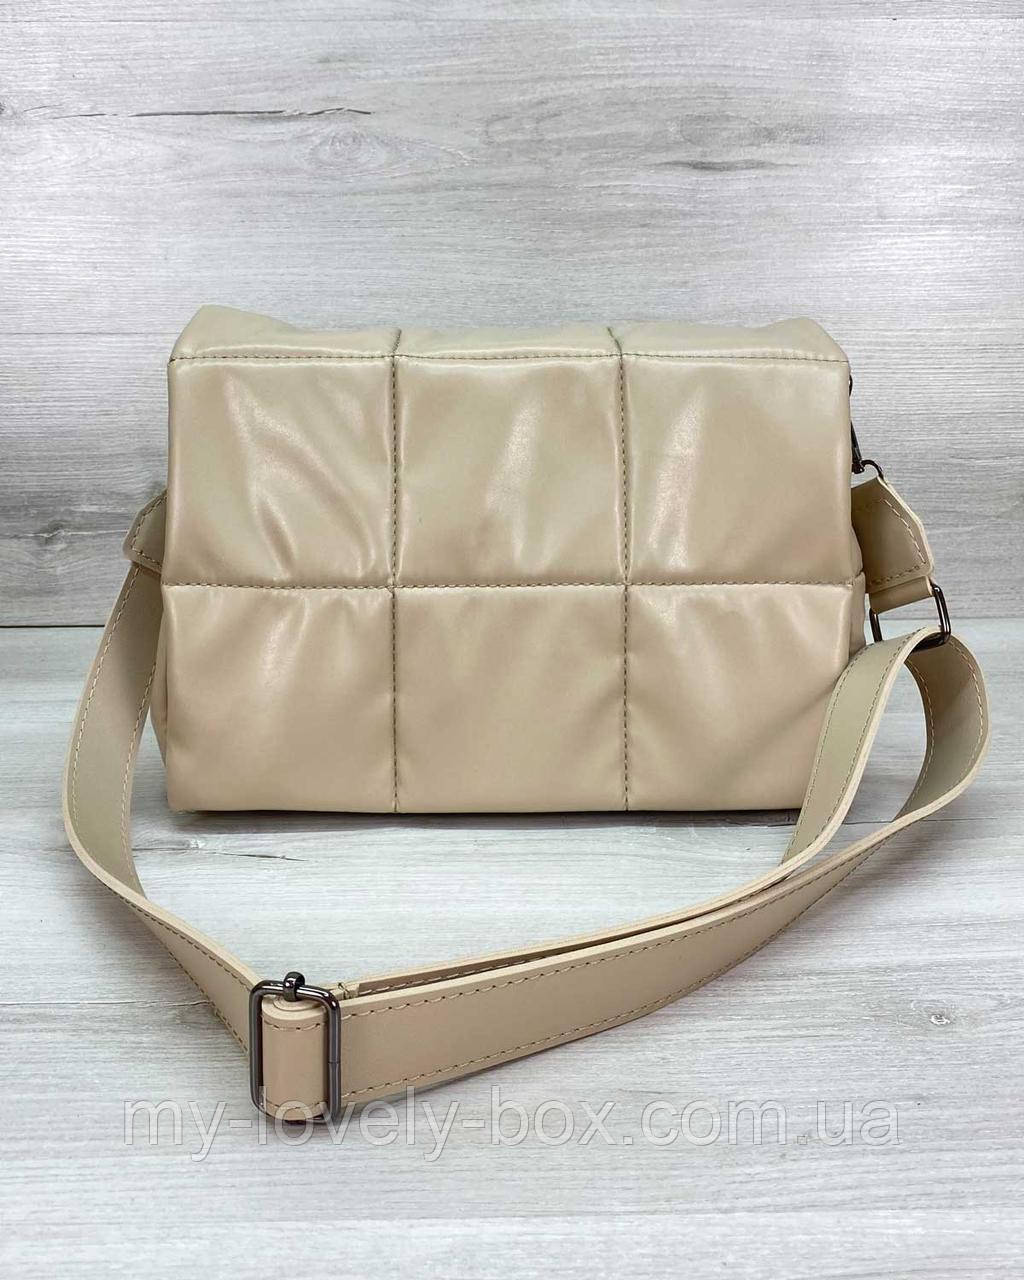 Жіноча сумка «Каміла» бежева